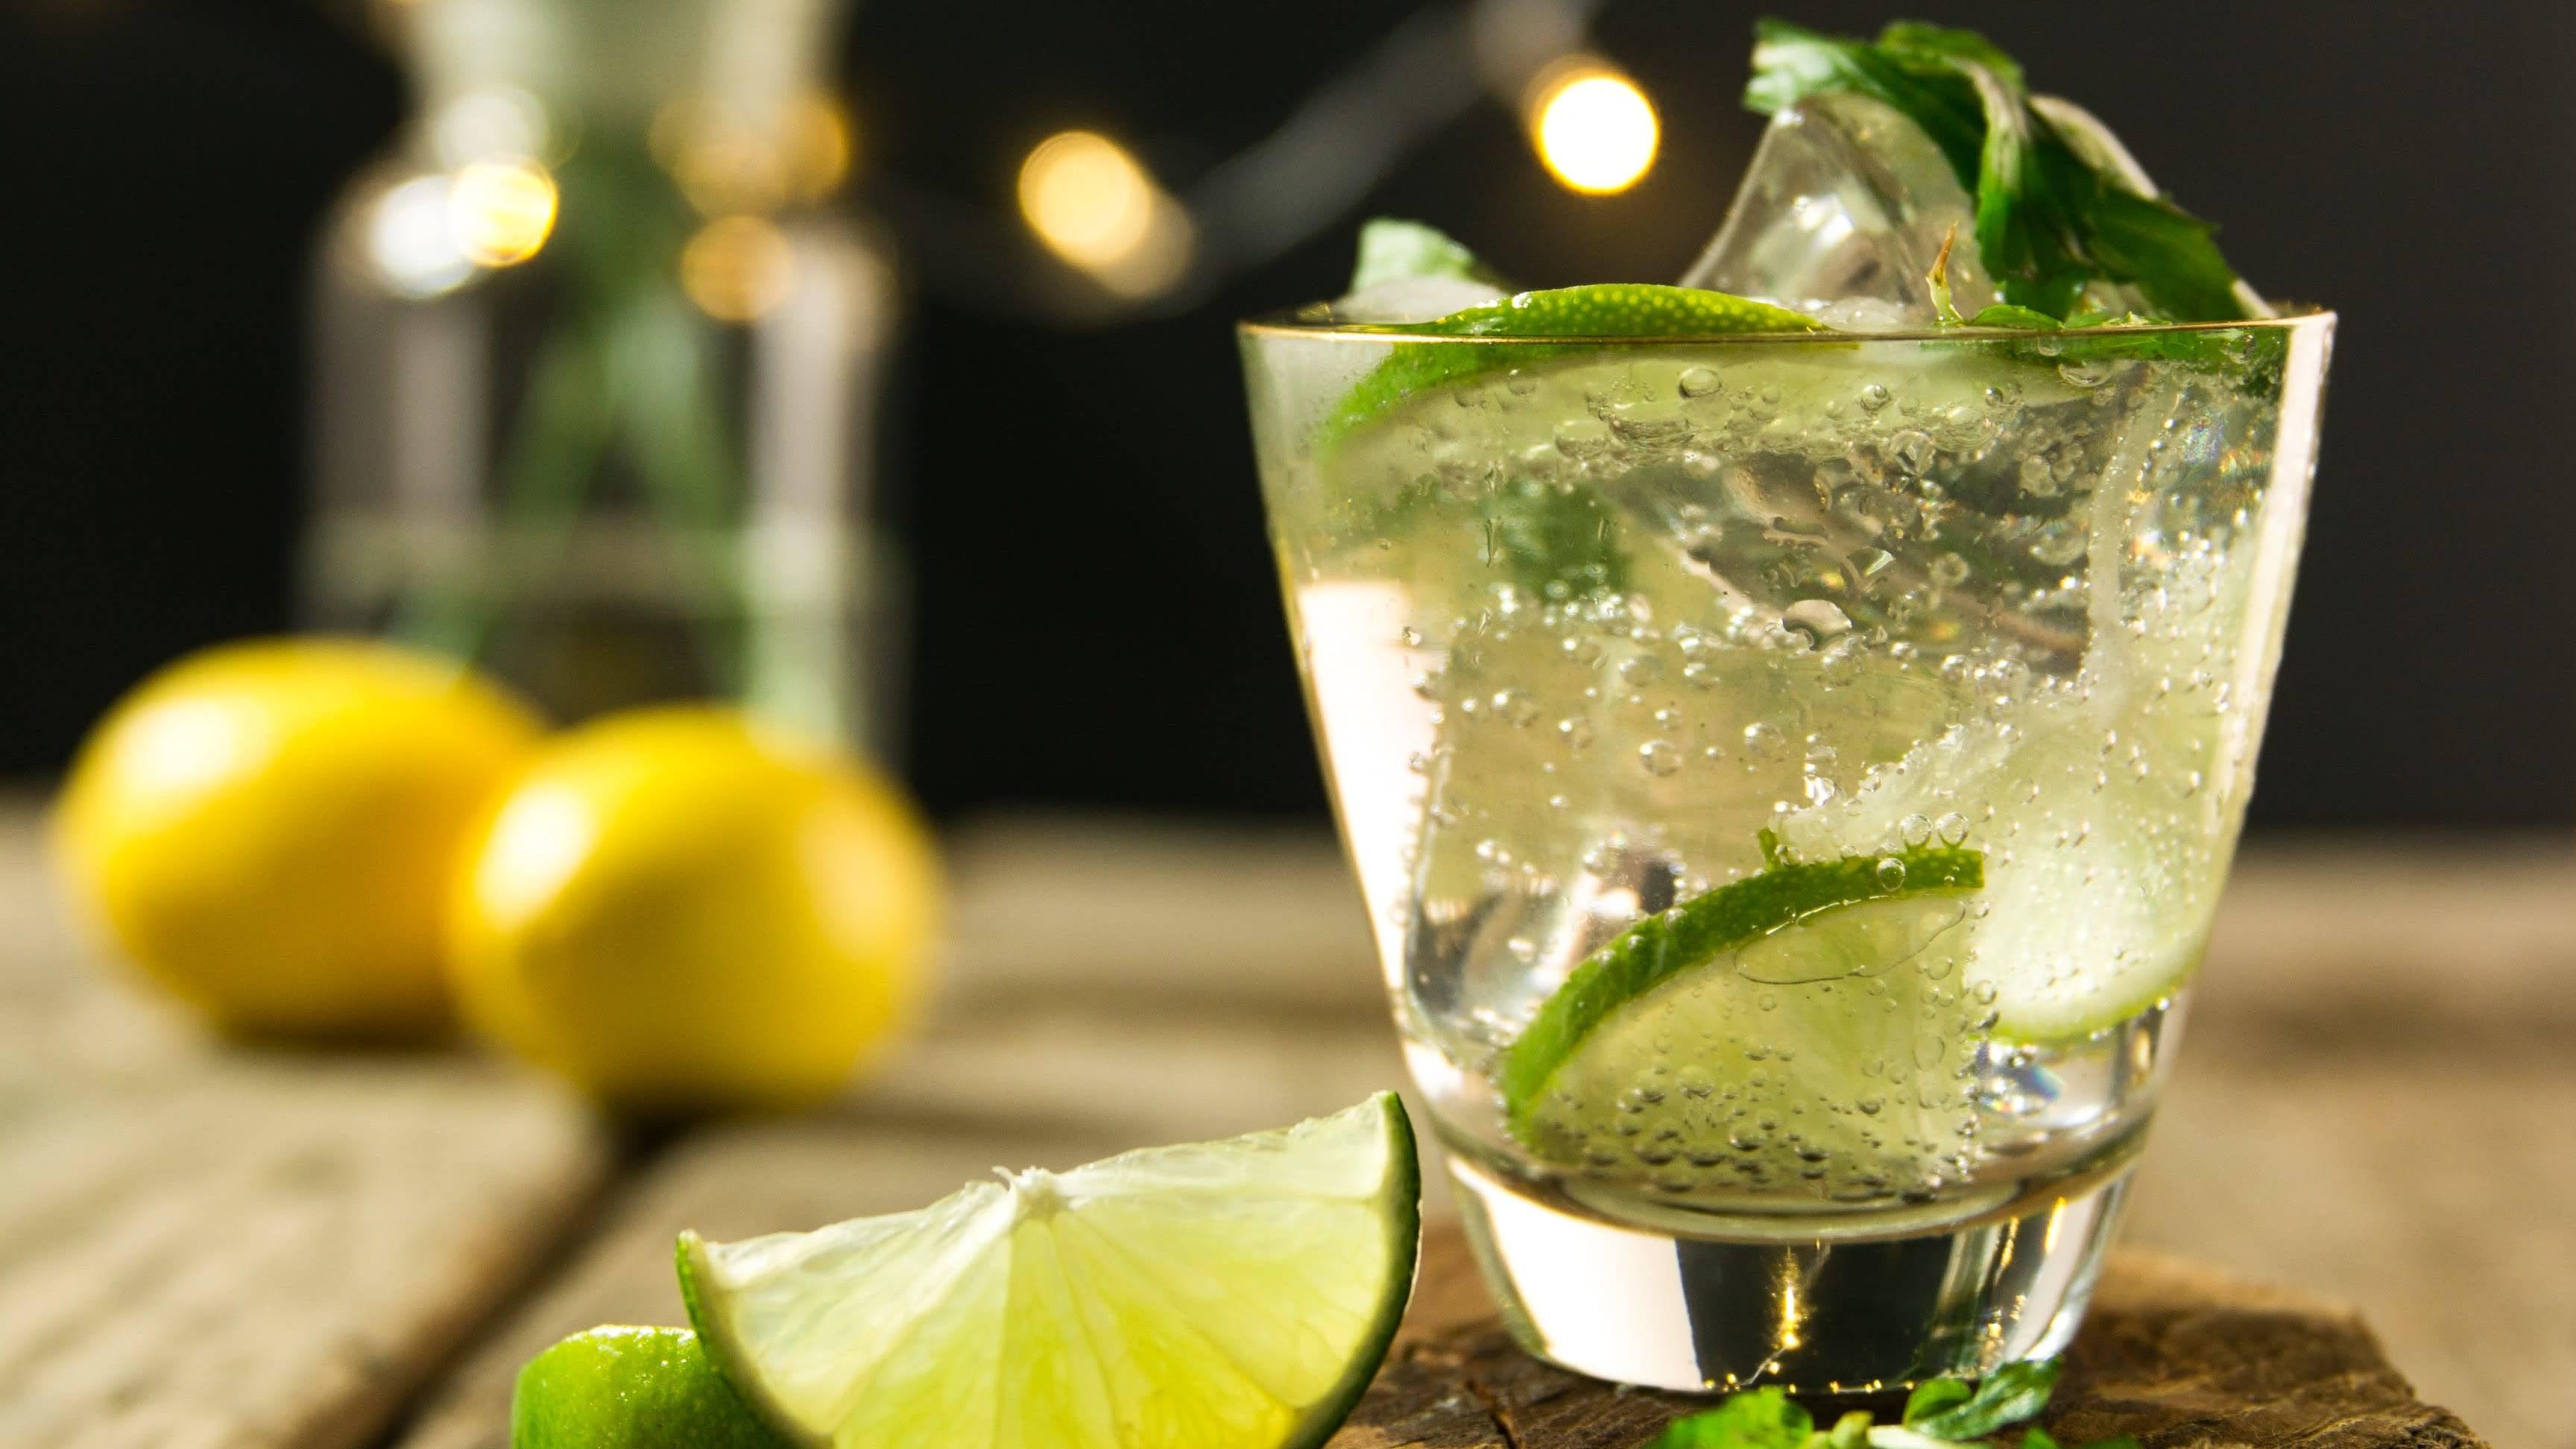 camper-english gin-and-tonic shopping skillet tonic